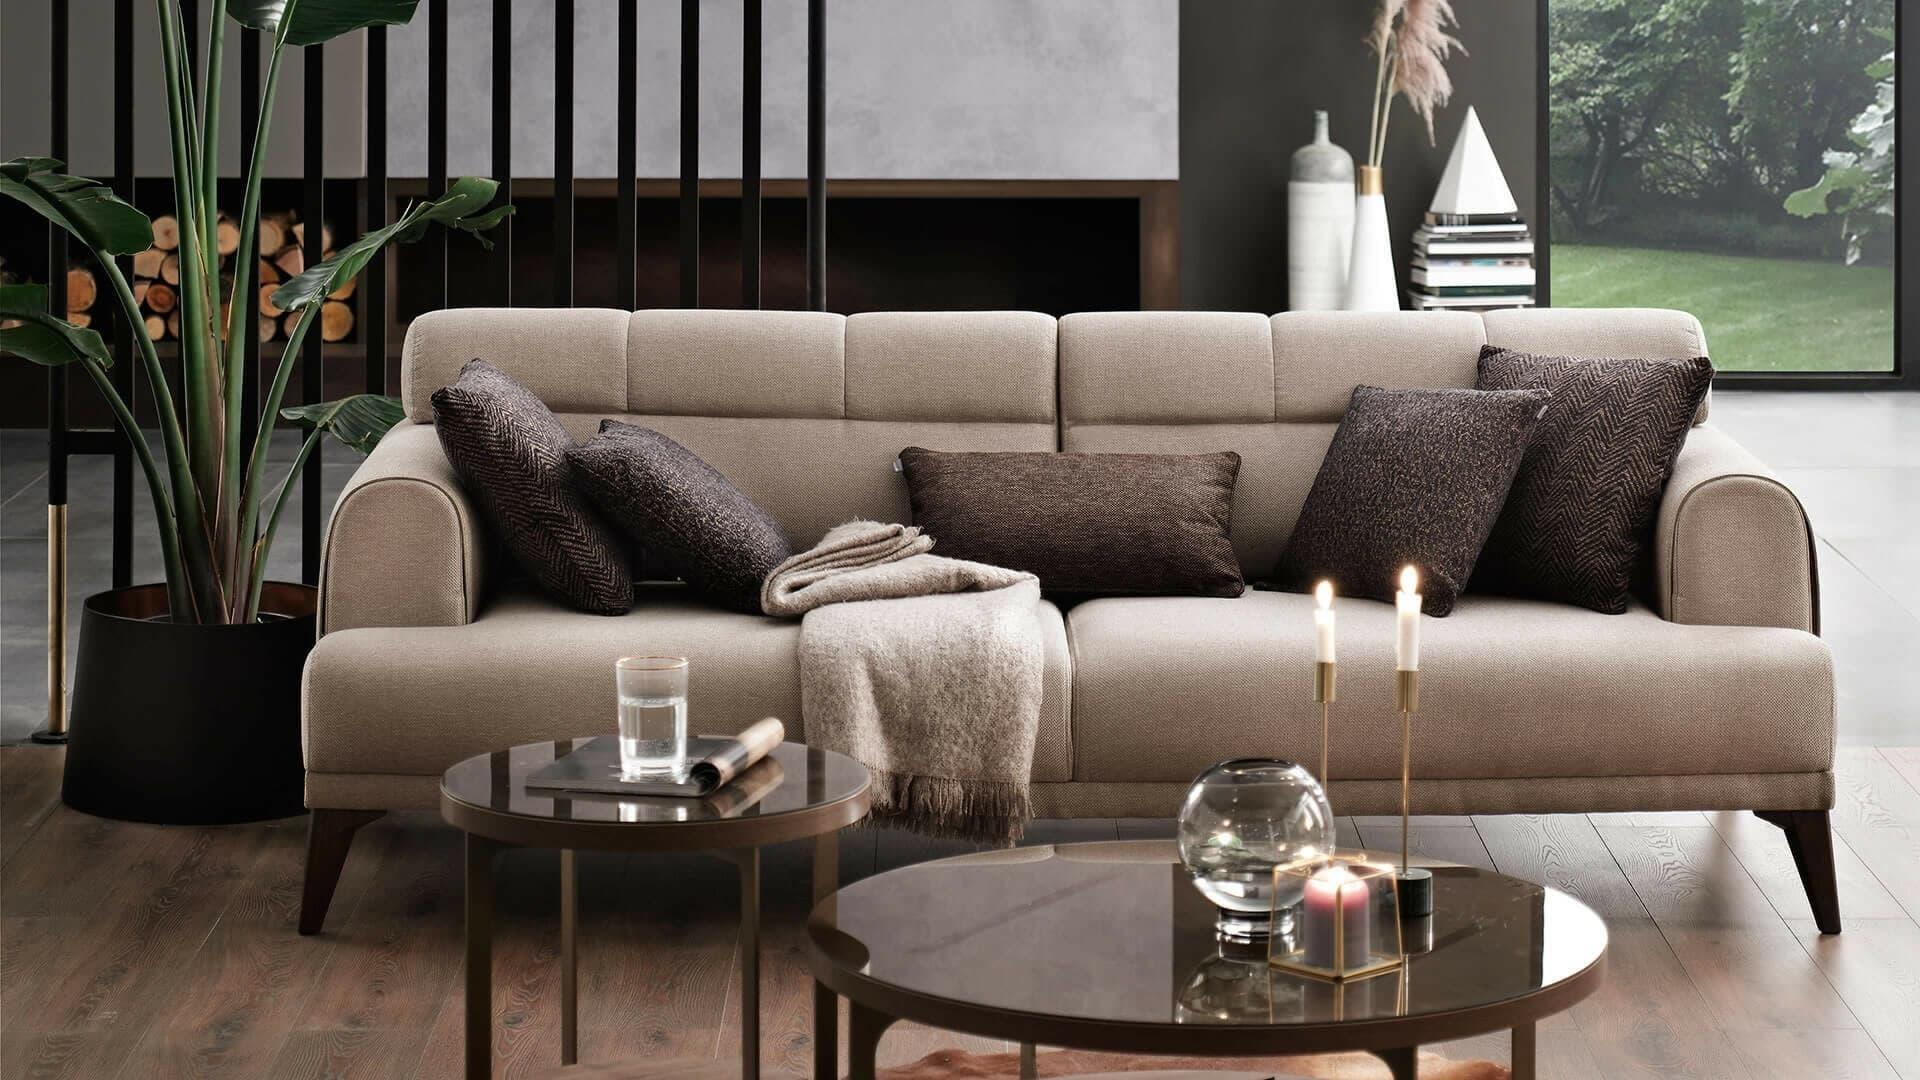 Canapea tapitata cu stofa, 3 locuri, cu functie sleep pentru 1 persoana Madrid Bej, l231xA102xH80 cm